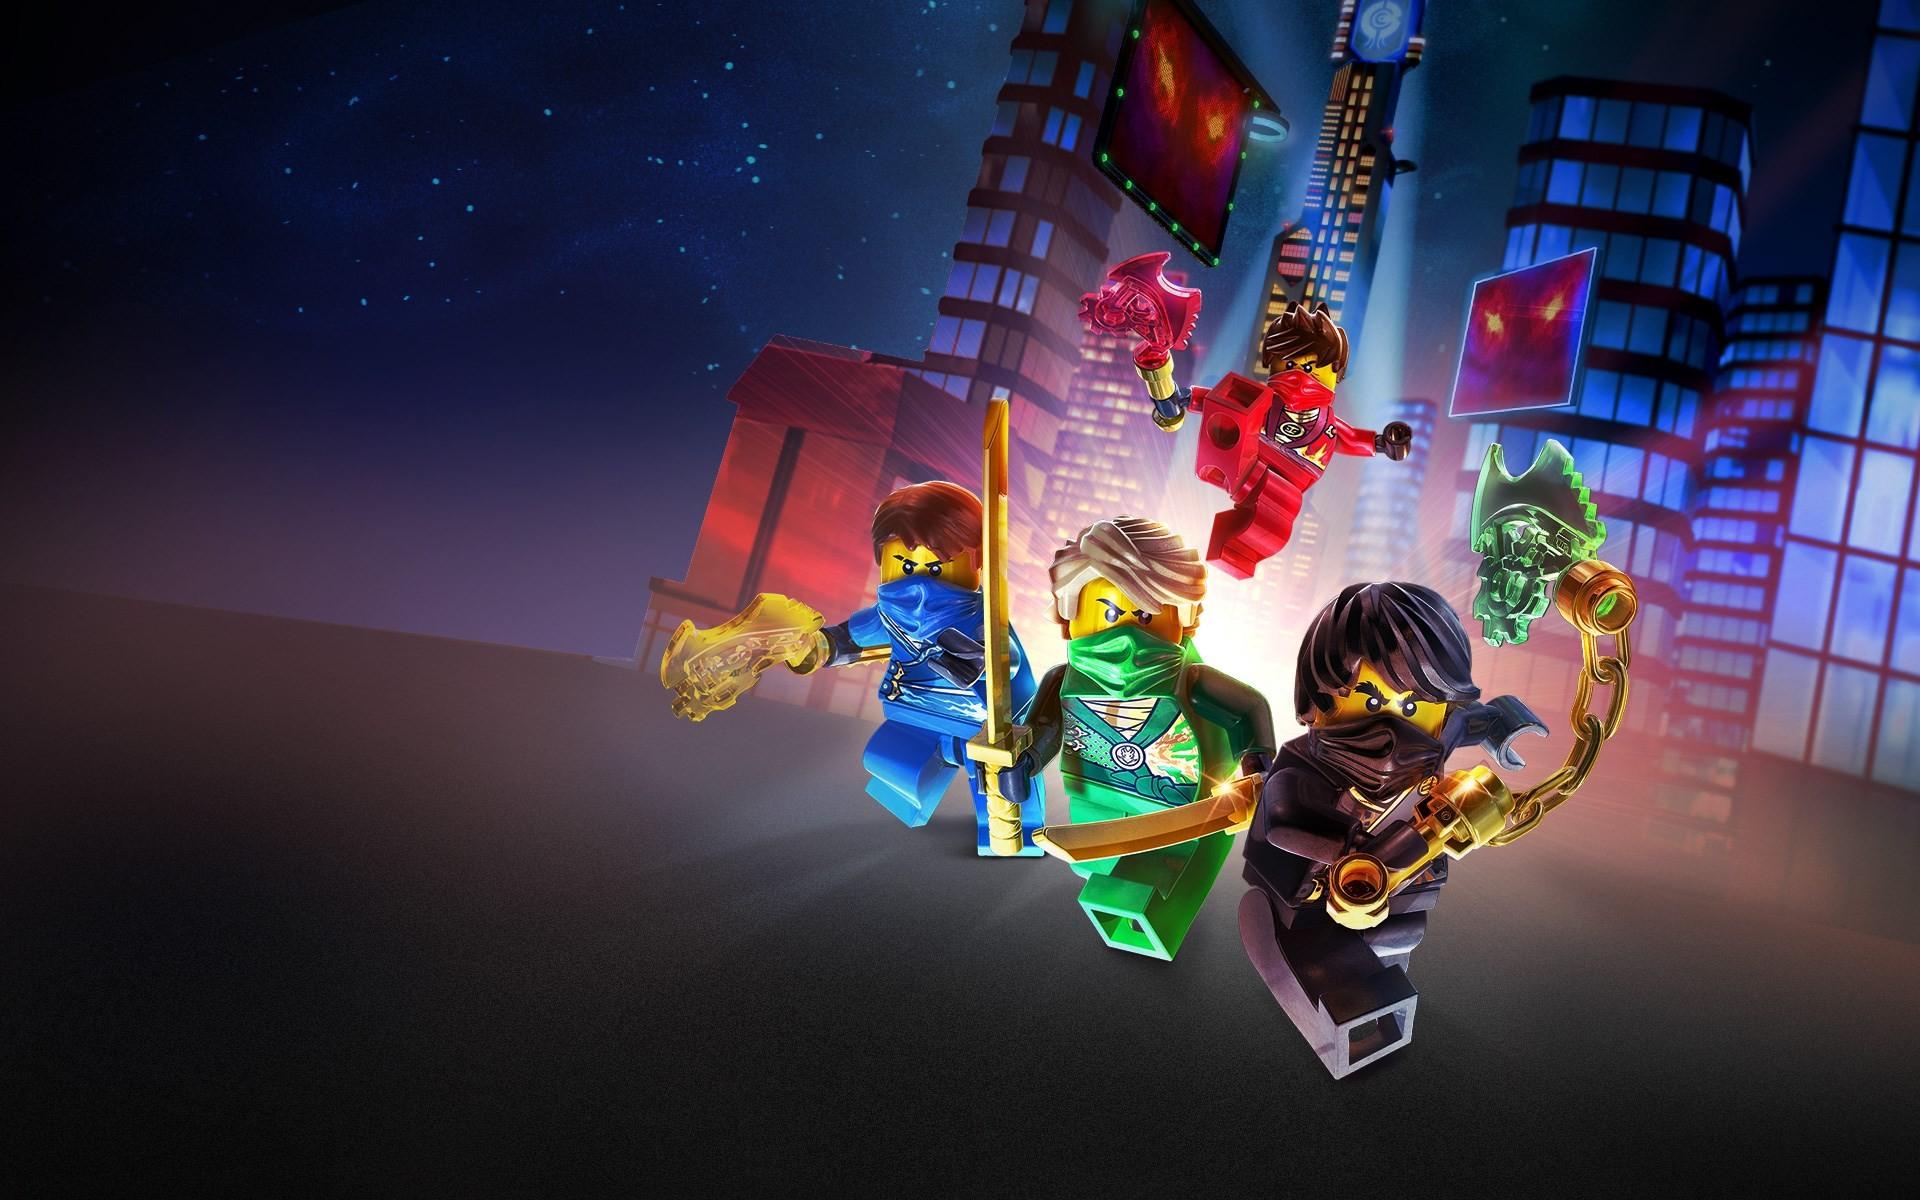 free desktop backgrounds for lego ninjago – lego ninjago category